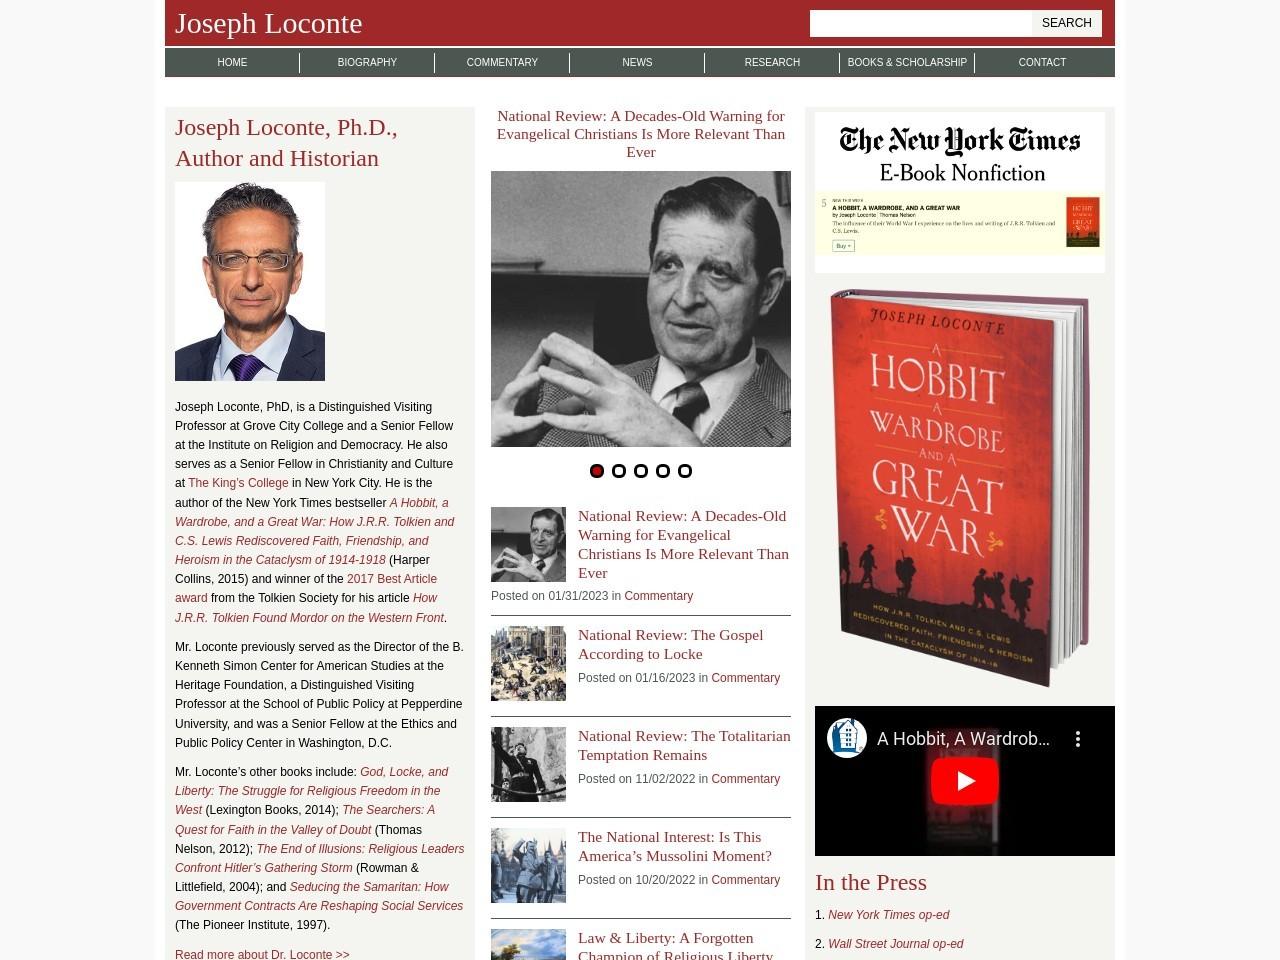 Screenshot of the website Joseph Loconte